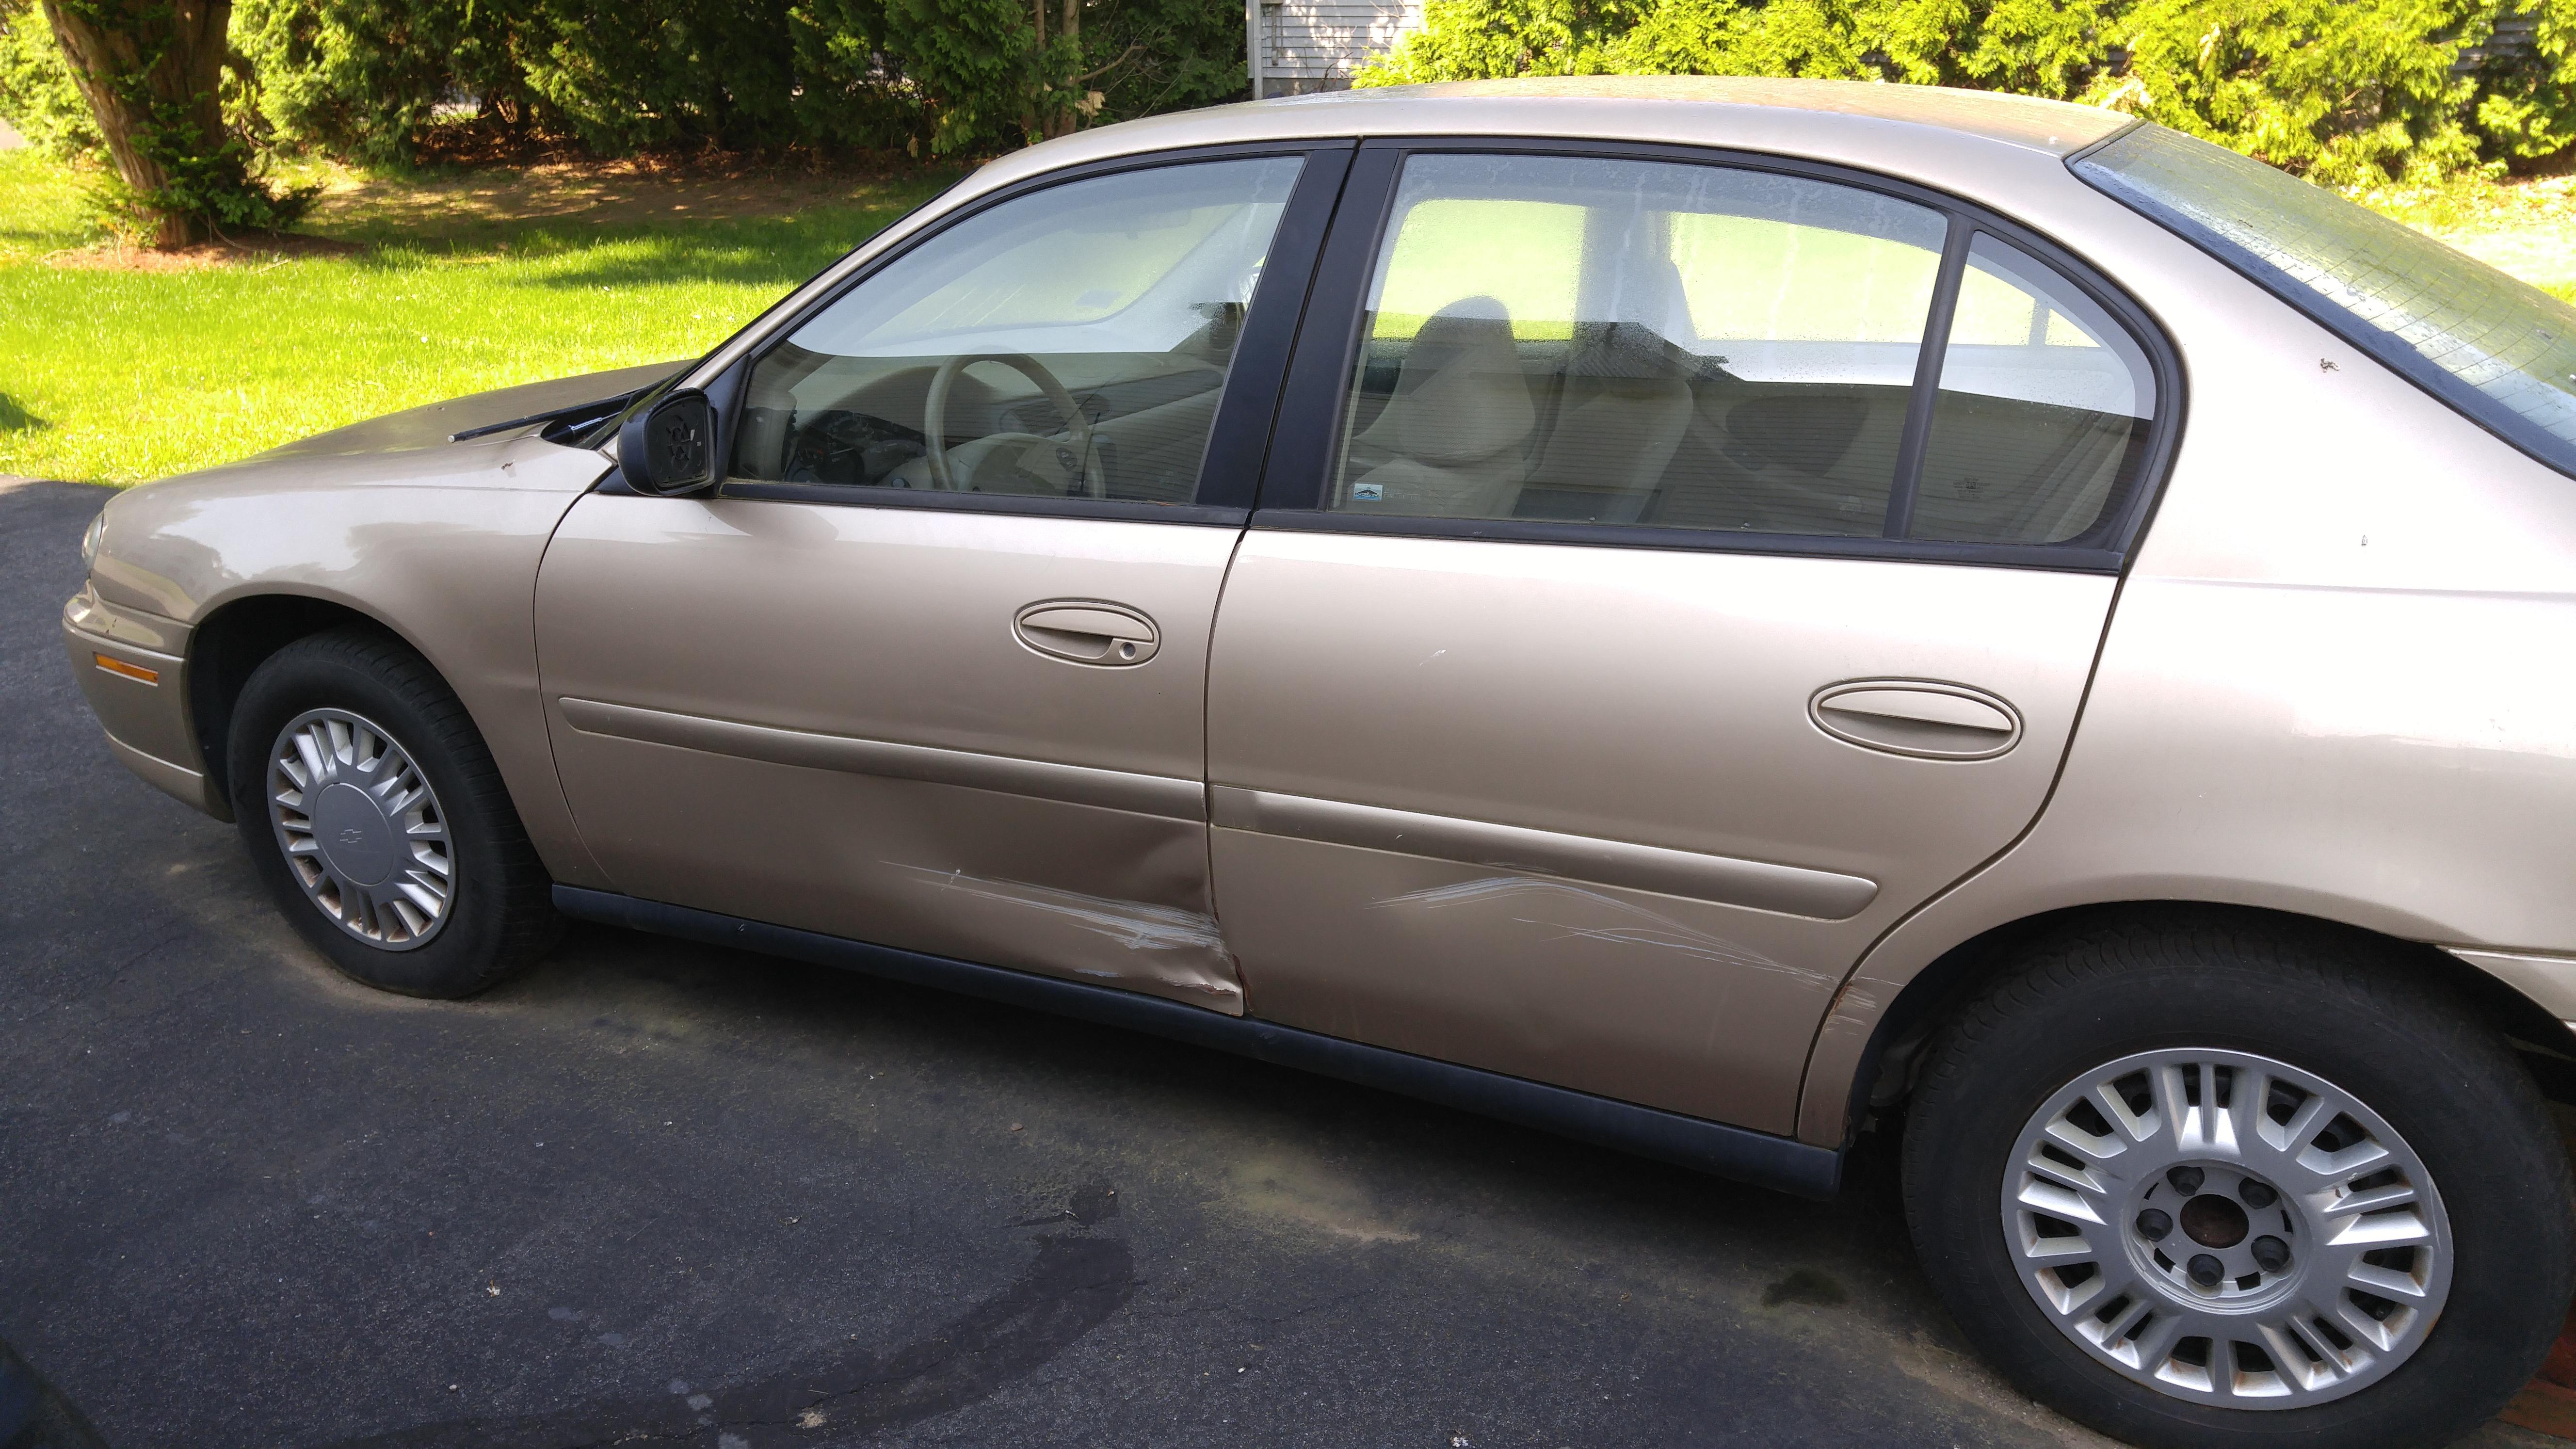 cash for cars peoria az sell your junk car the clunker junker. Black Bedroom Furniture Sets. Home Design Ideas